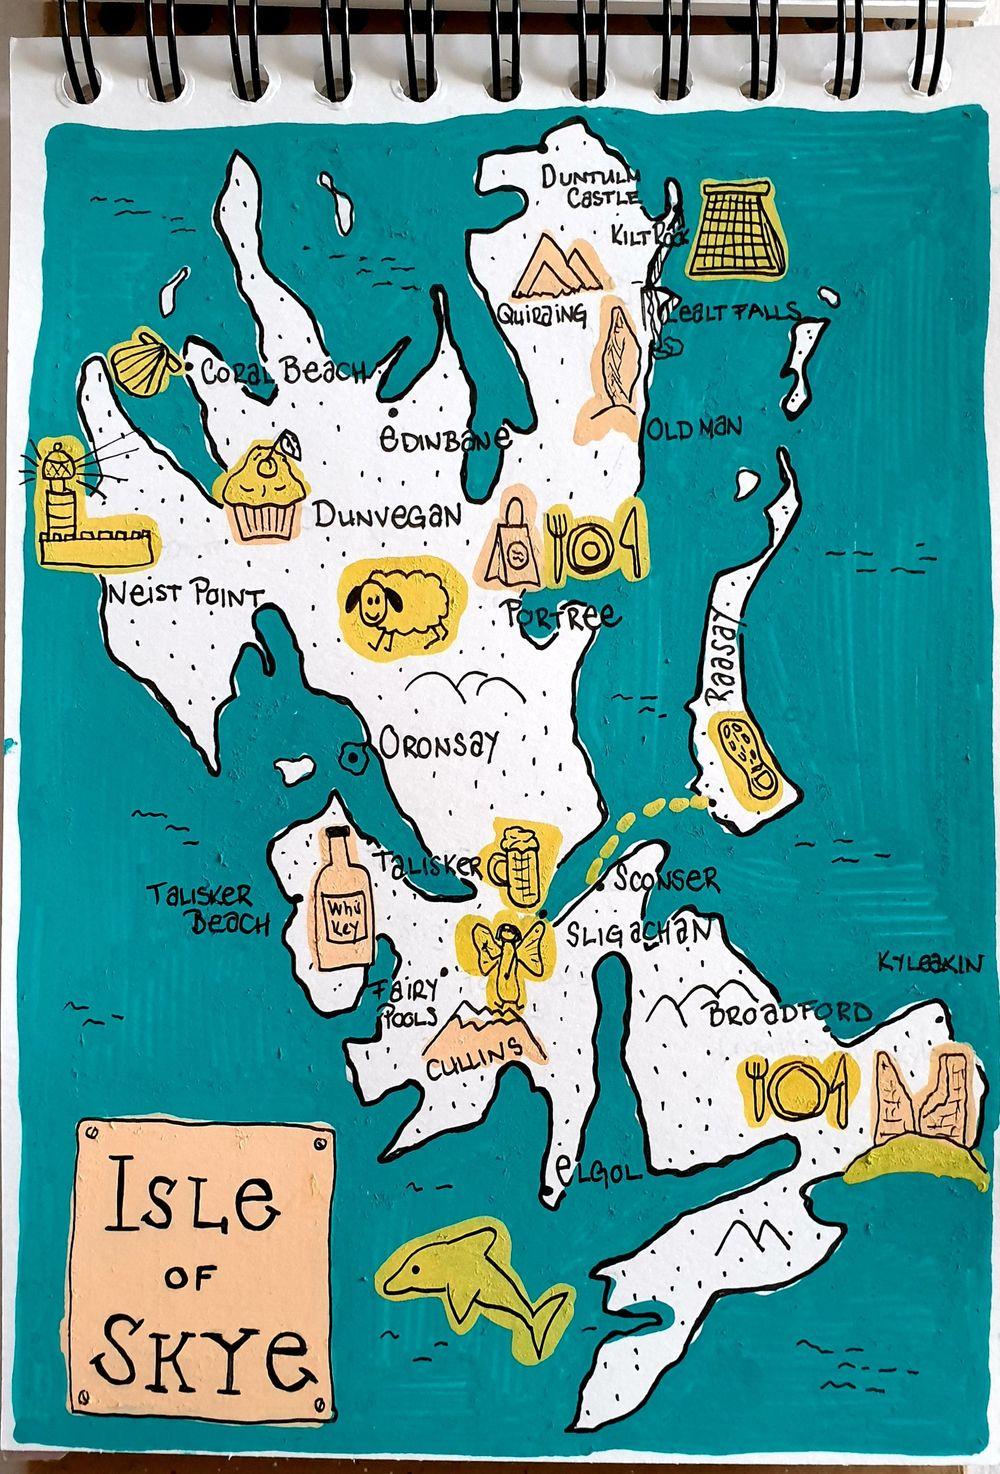 Isle of Skye - image 1 - student project